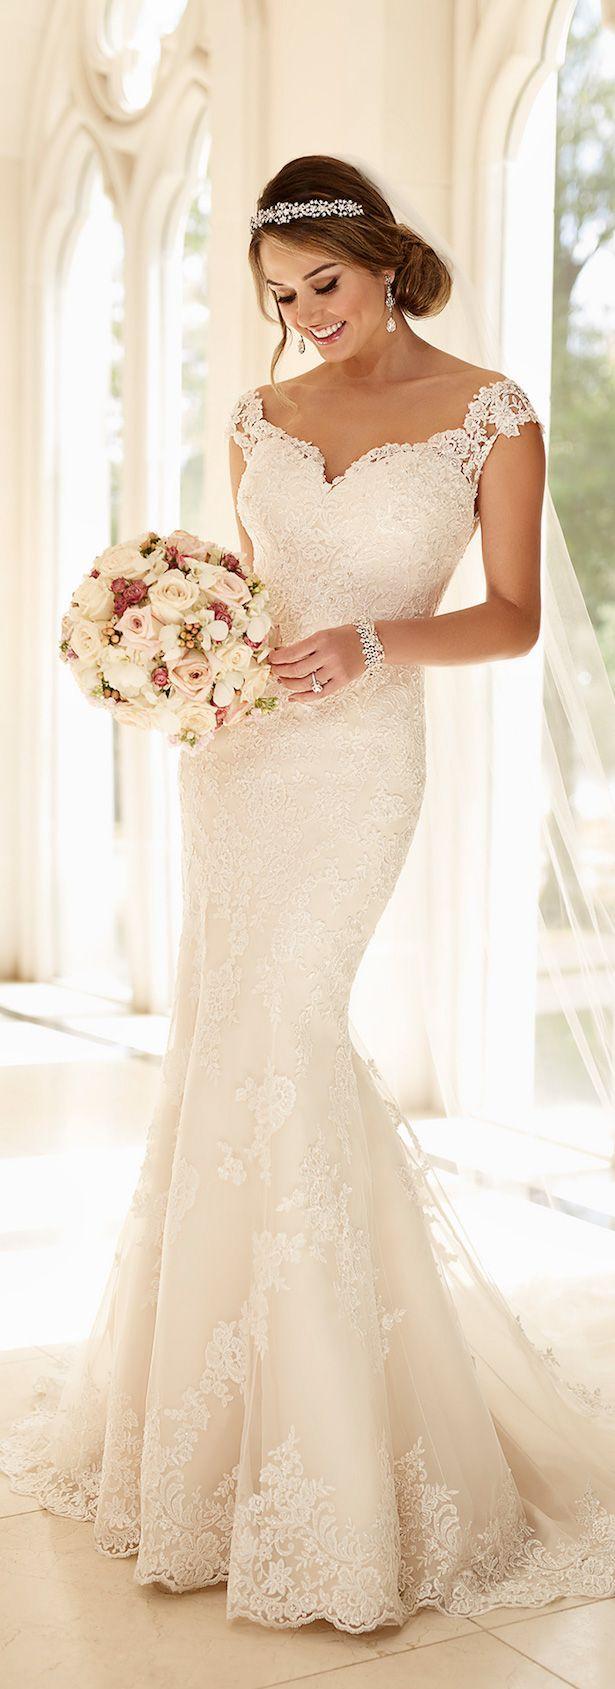 Stella York Spring 2016 Wedding Dress - Belle The Magazine #wedding #weddingdress